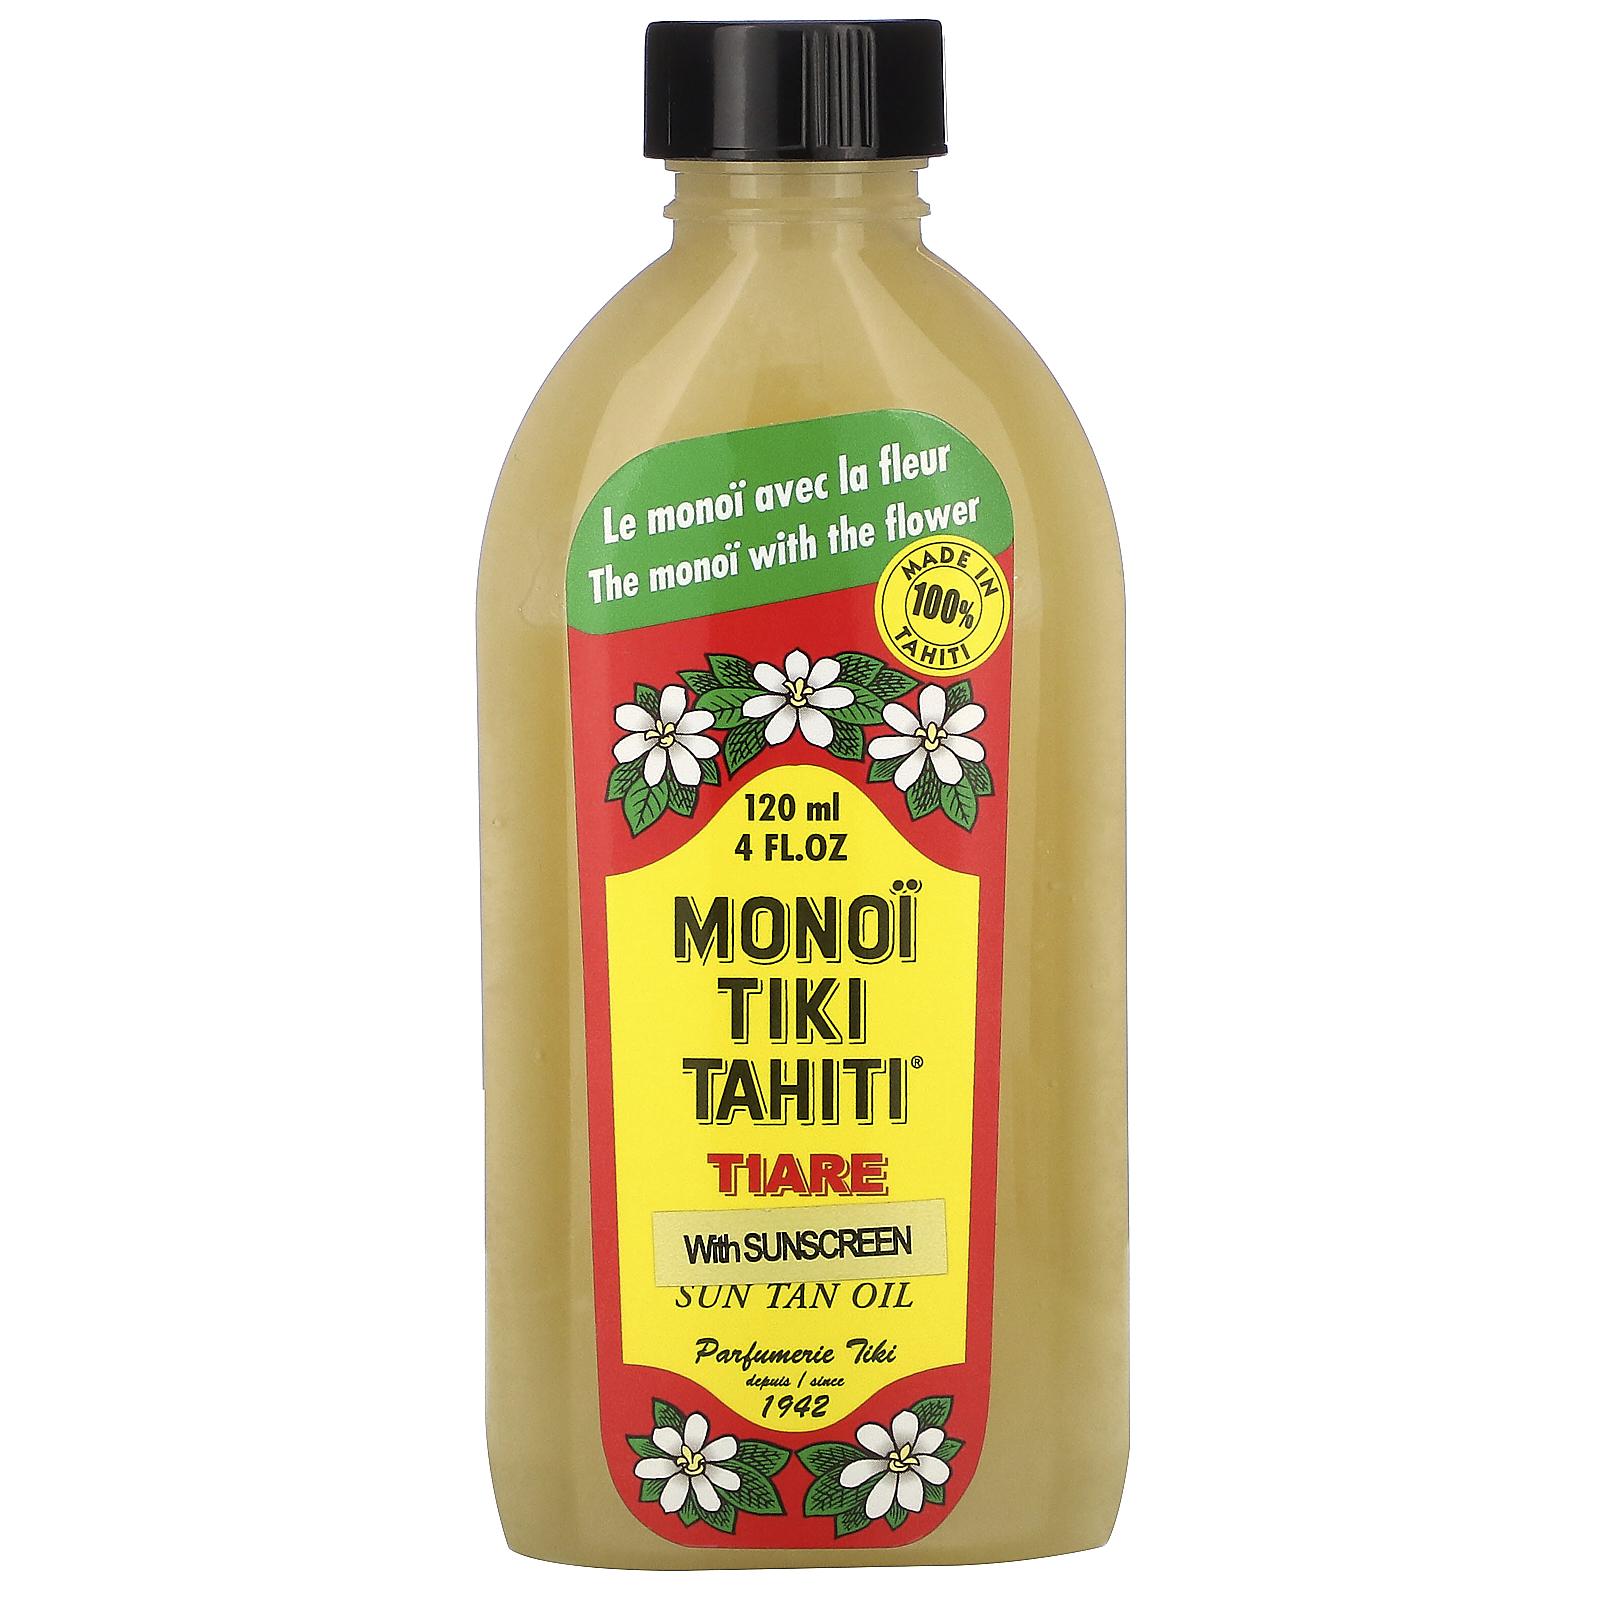 Monoi Tiare Tahiti, Sun Tan Oil With Sunscreen, SPF 8, 8 fl oz ...